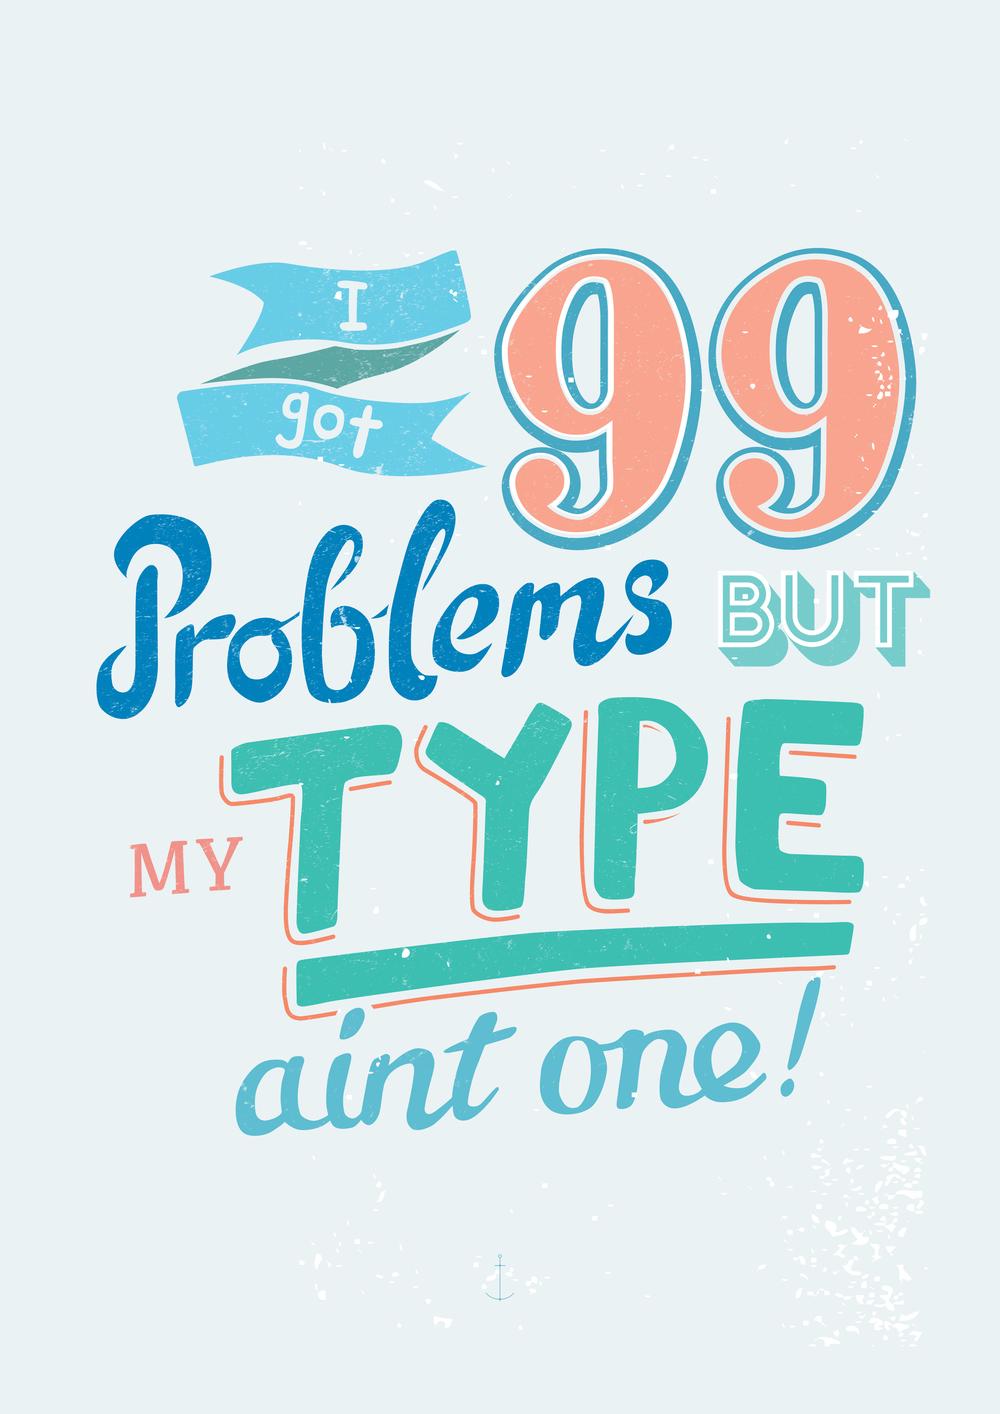 99 Problems A3.jpg